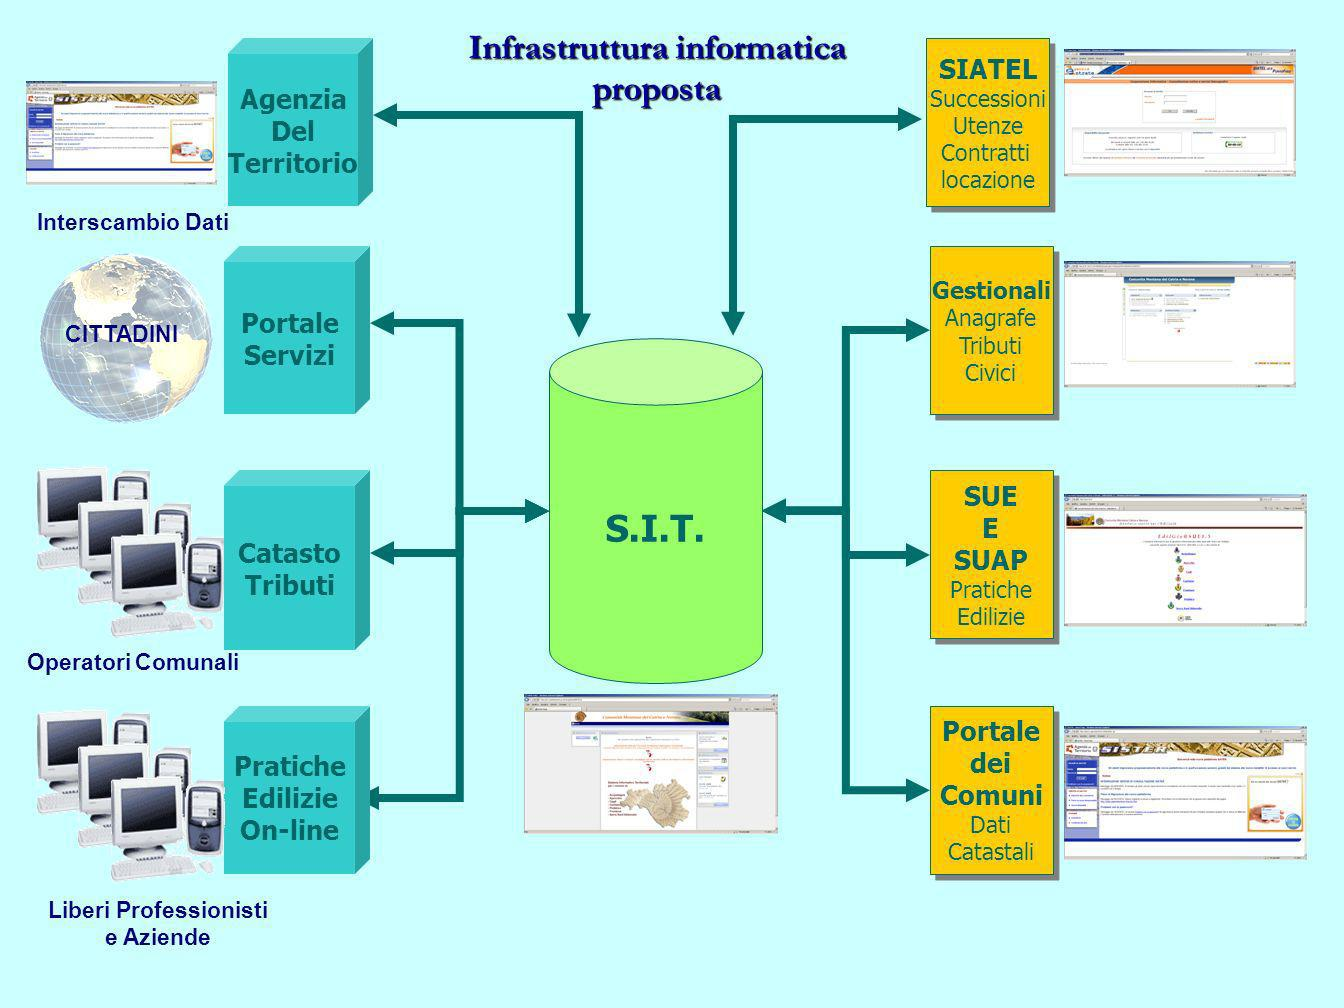 Infrastruttura informatica proposta S.I.T. Gestionali Anagrafe Tributi Civici Gestionali Anagrafe Tributi Civici SUE E SUAP Pratiche Edilizie SUE E SU